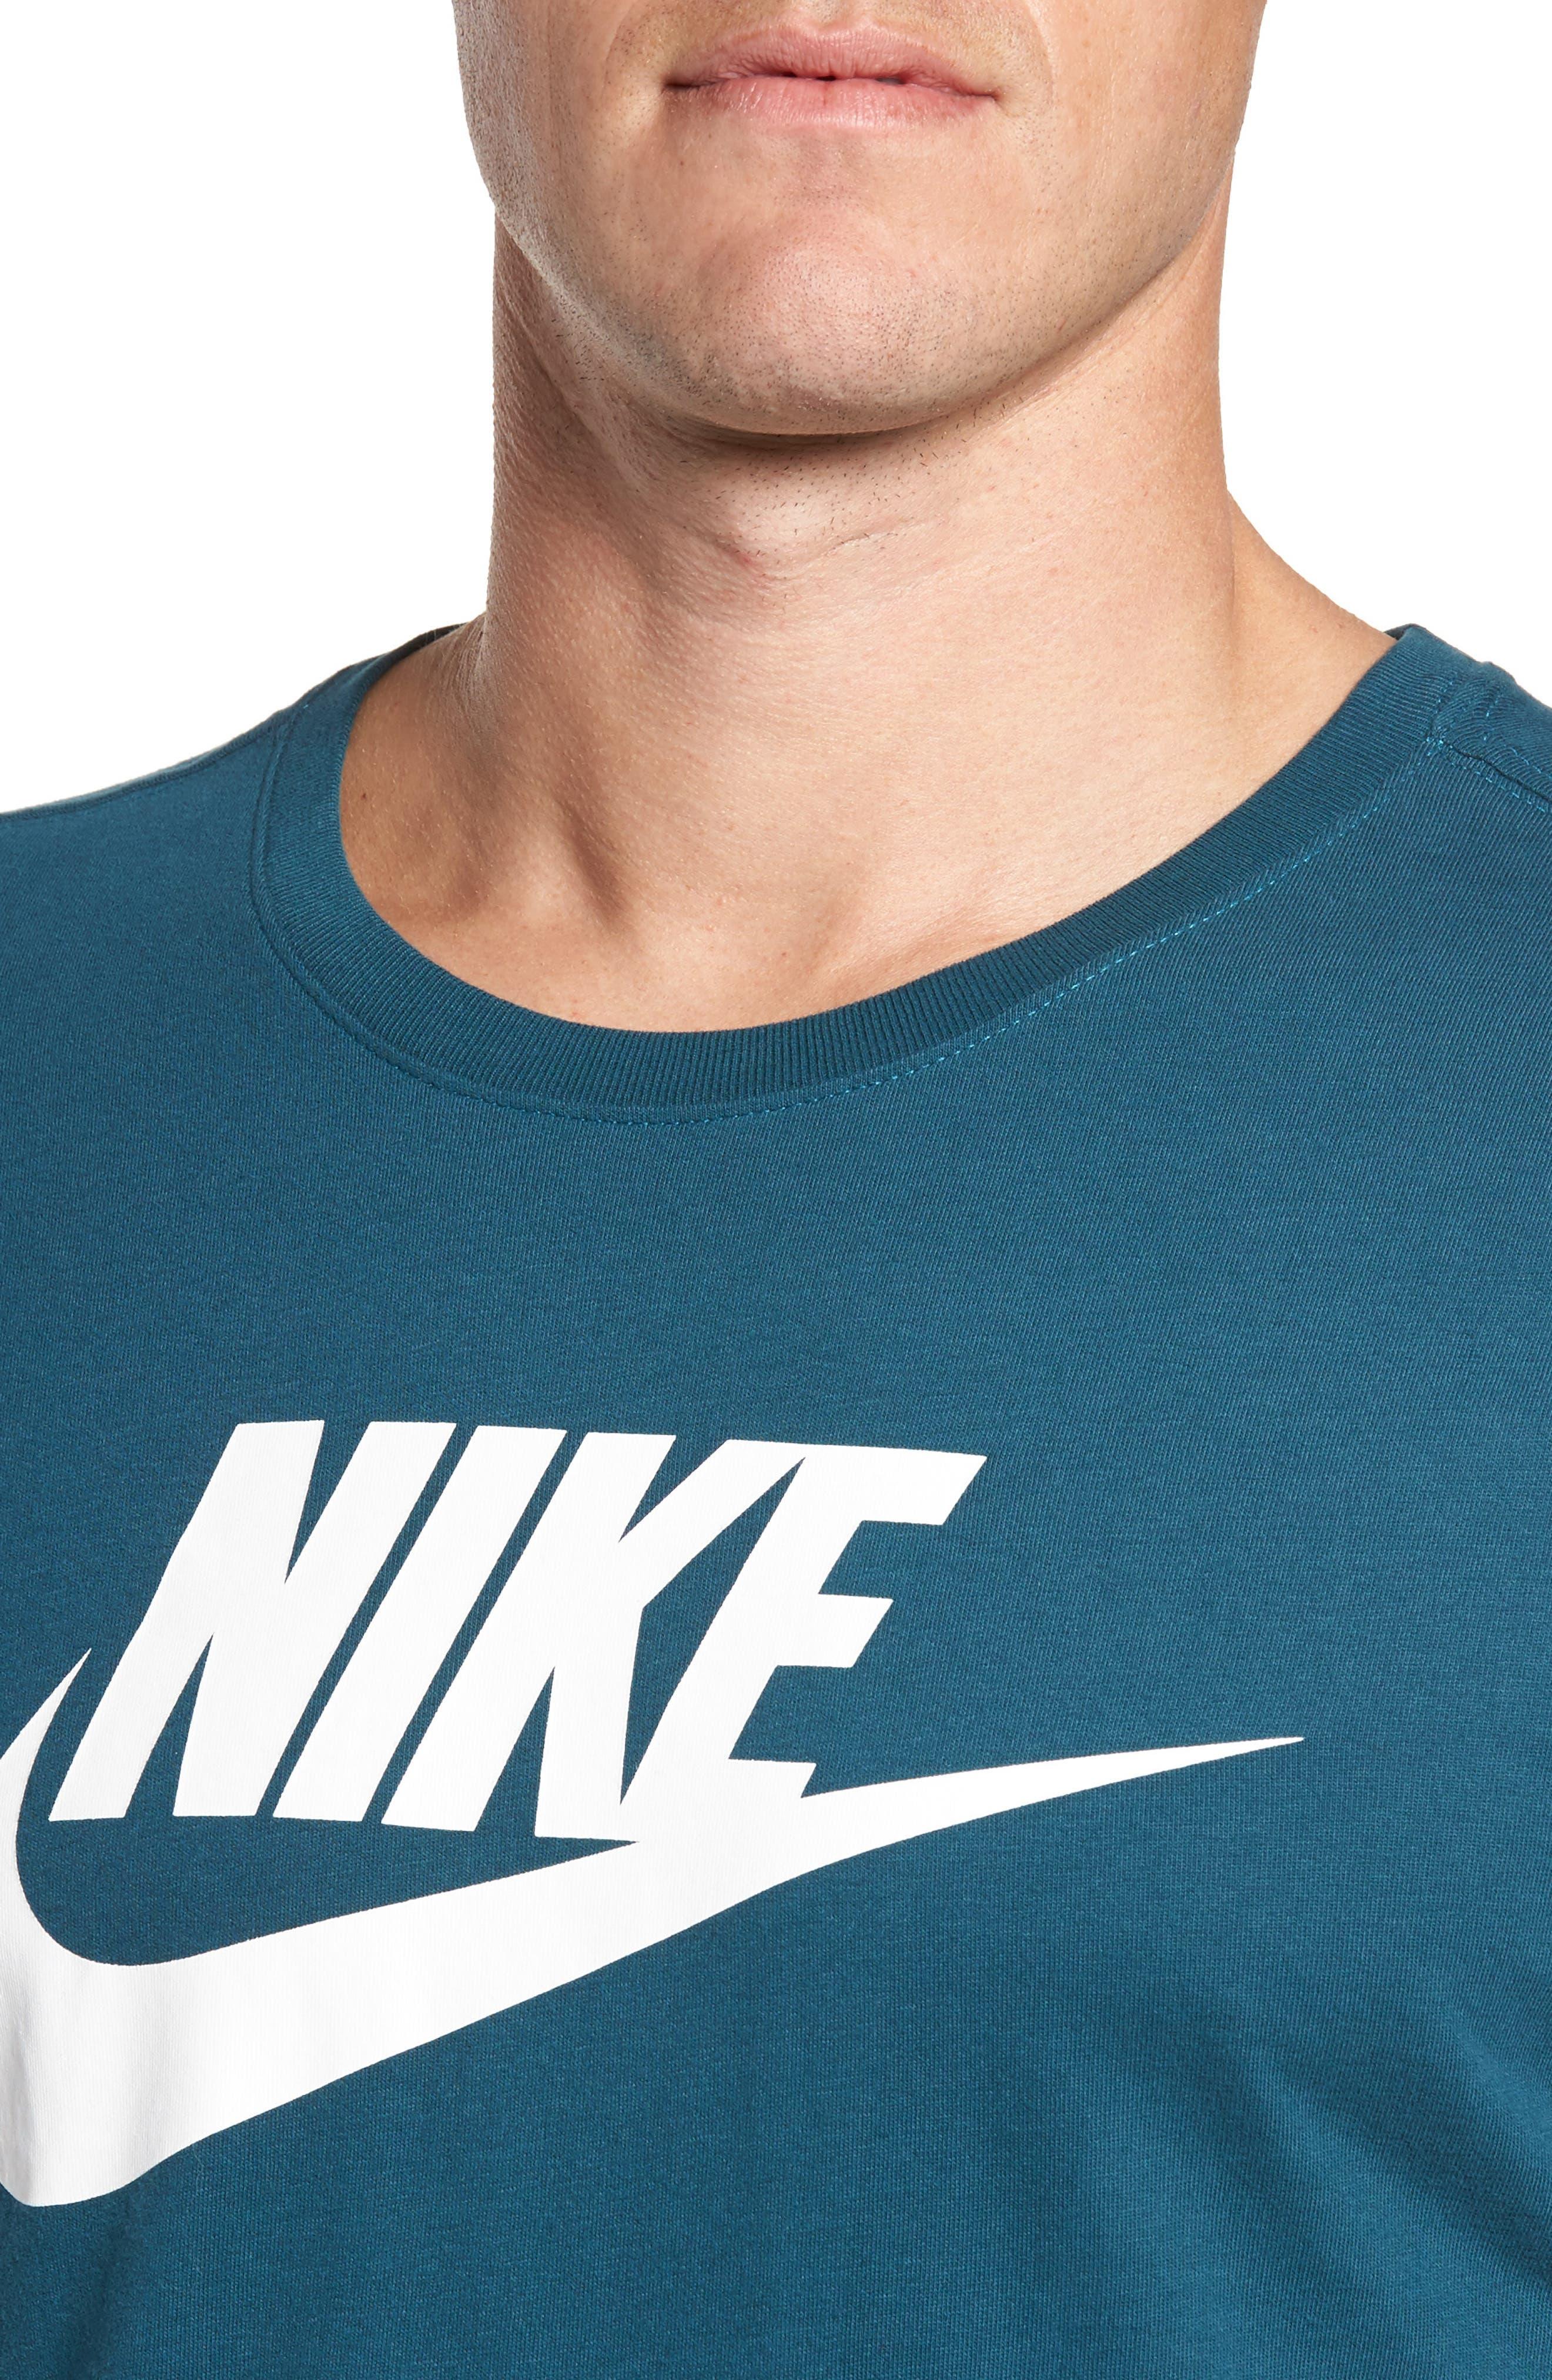 'Tee-Futura Icon' Graphic T-Shirt,                             Alternate thumbnail 4, color,                             Space Blue/ White